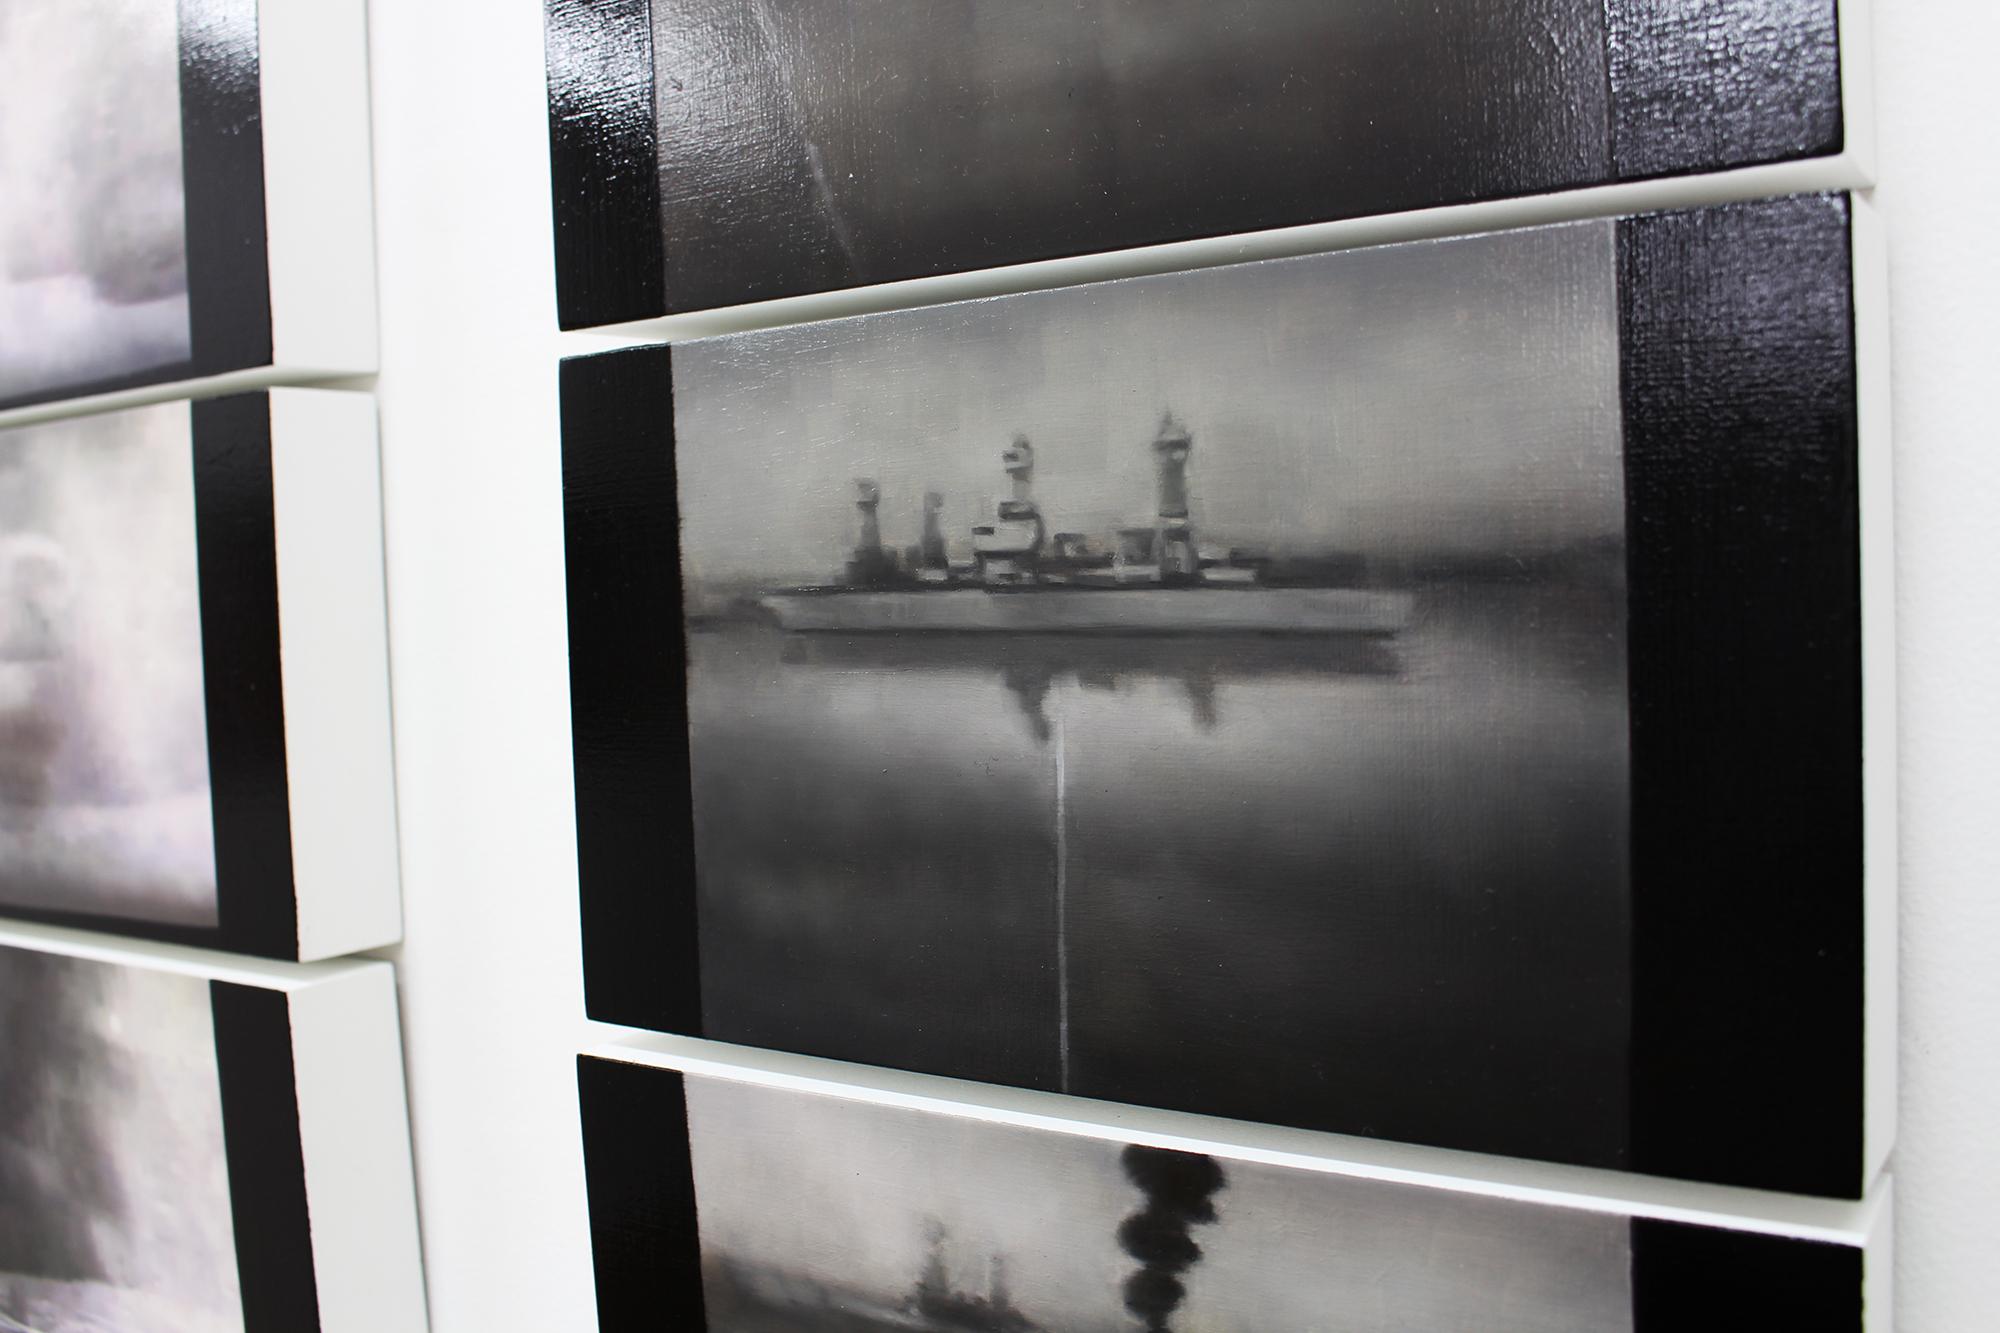 Ways of war, Oil on wood, 108 x 220 cm, details